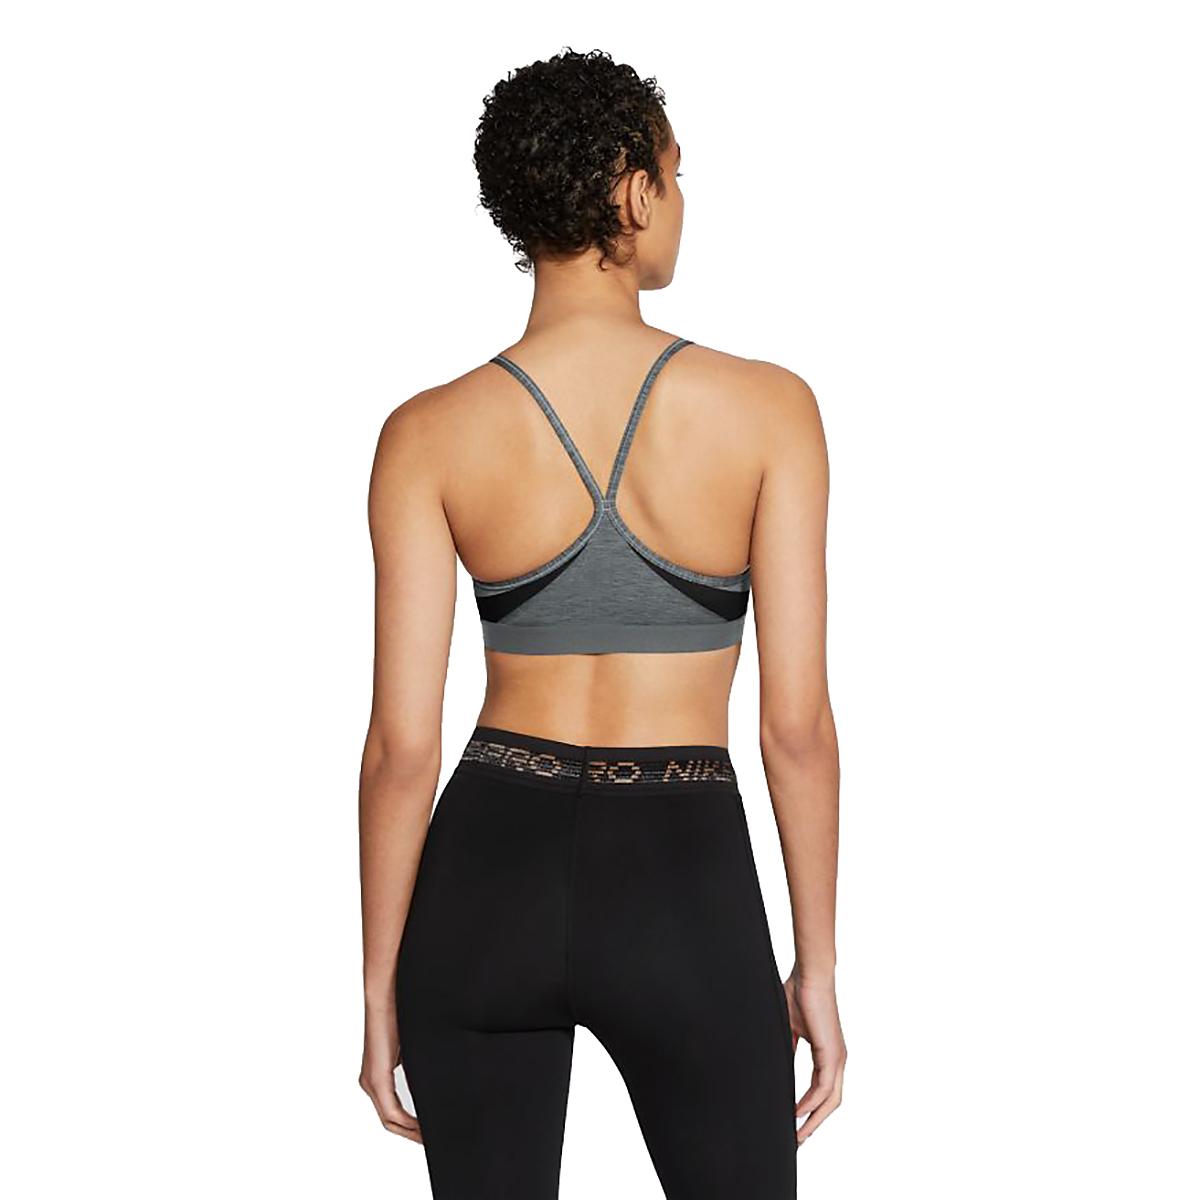 Women's Nike Dri-FIT Indy Light-Support Padded U-Neck Sports Bra, , large, image 2